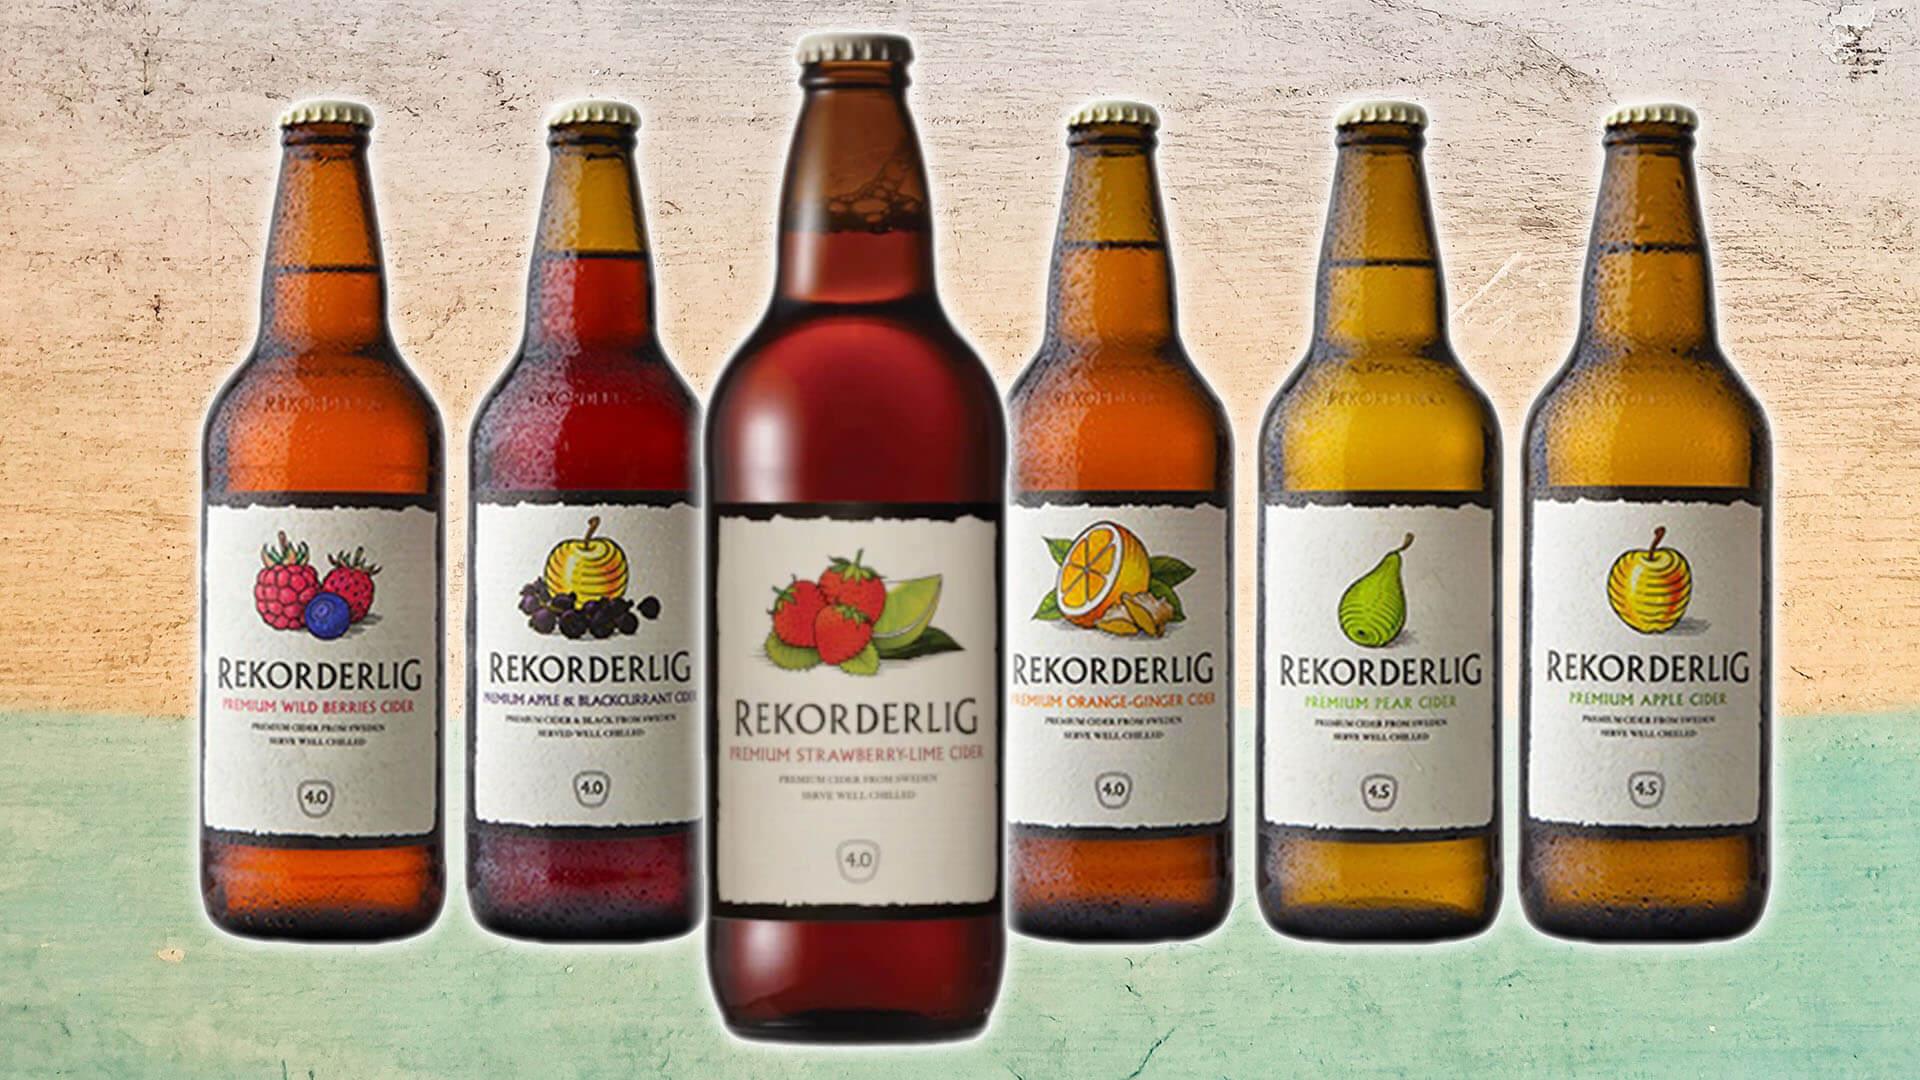 Rekorderlig Announces Its Ciders Are Now Vegan